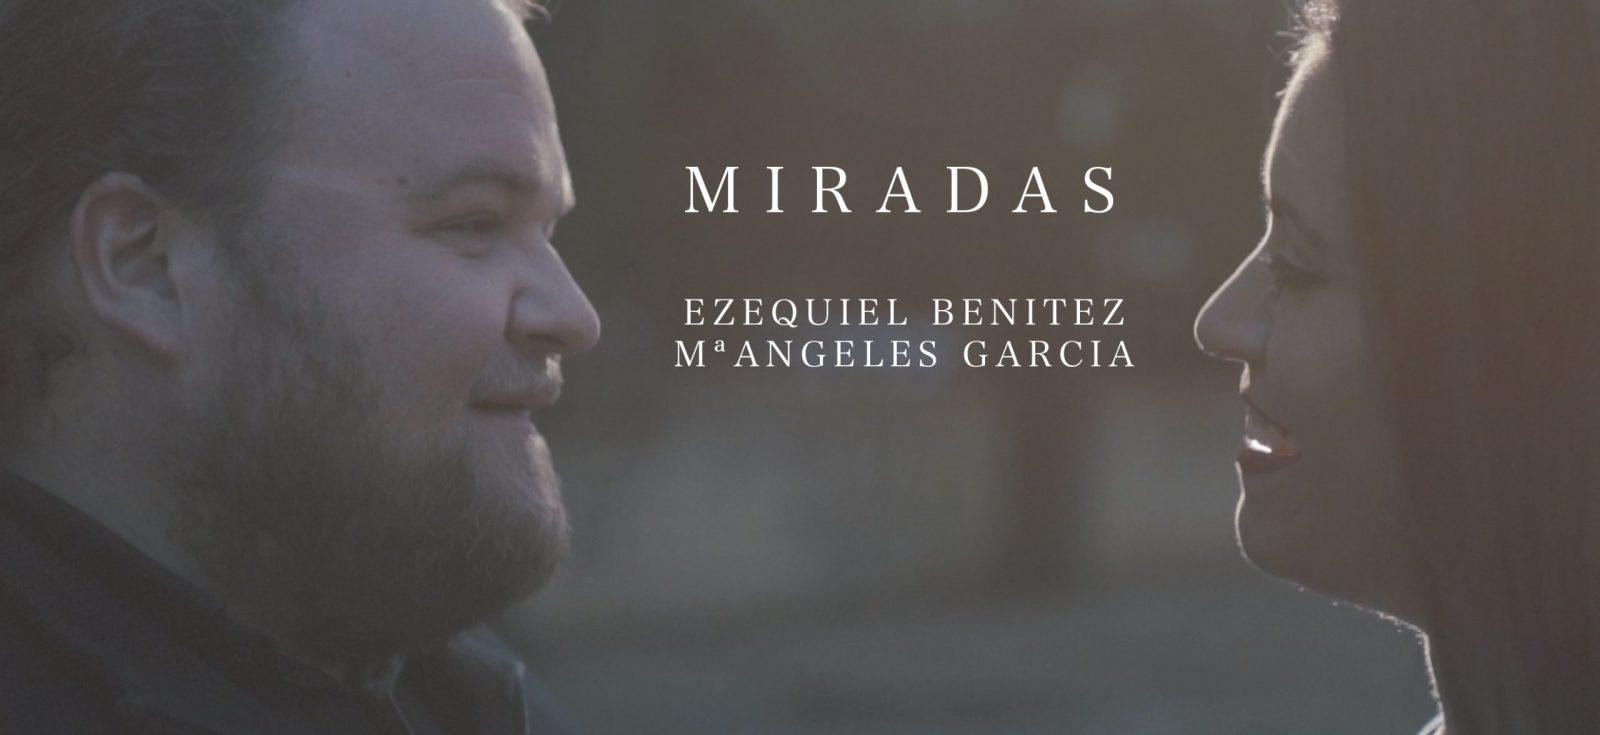 Preboda Ezequiel Benitez y Mª Angeles en Jerez